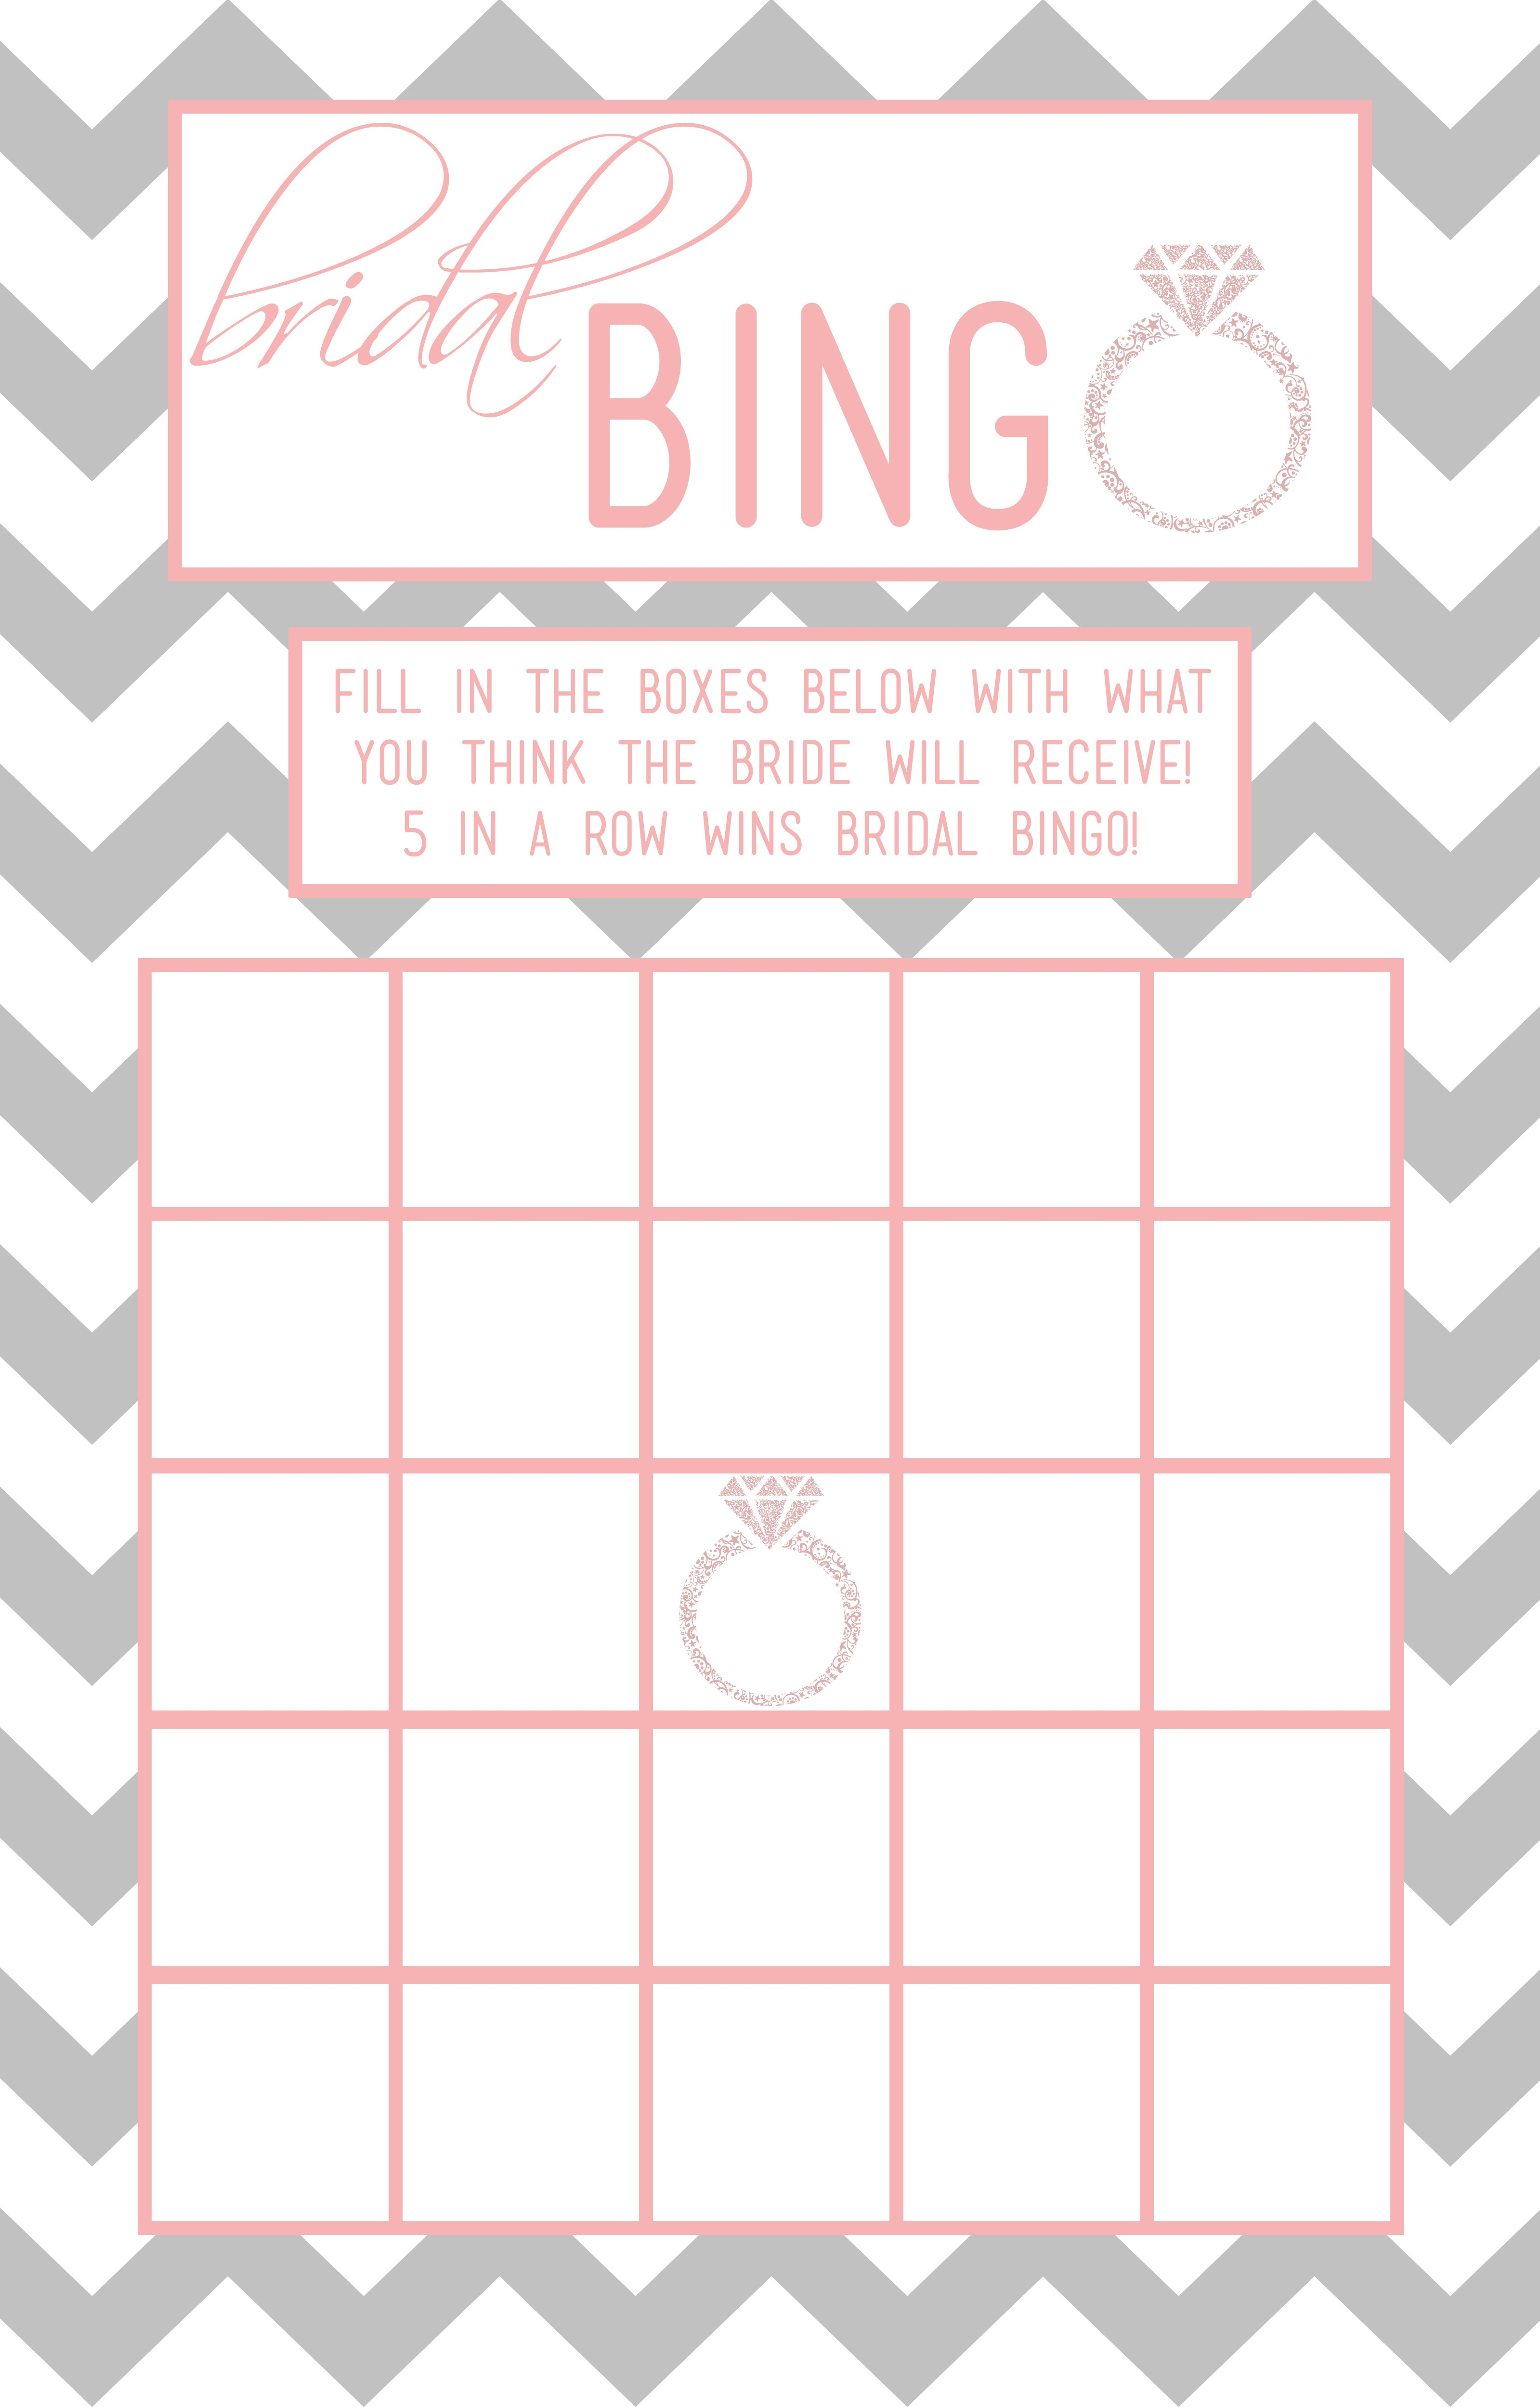 Bridal Bingo Template – 28 Images – Free Printable Bridal Shower - Free Printable Bridal Shower Bingo